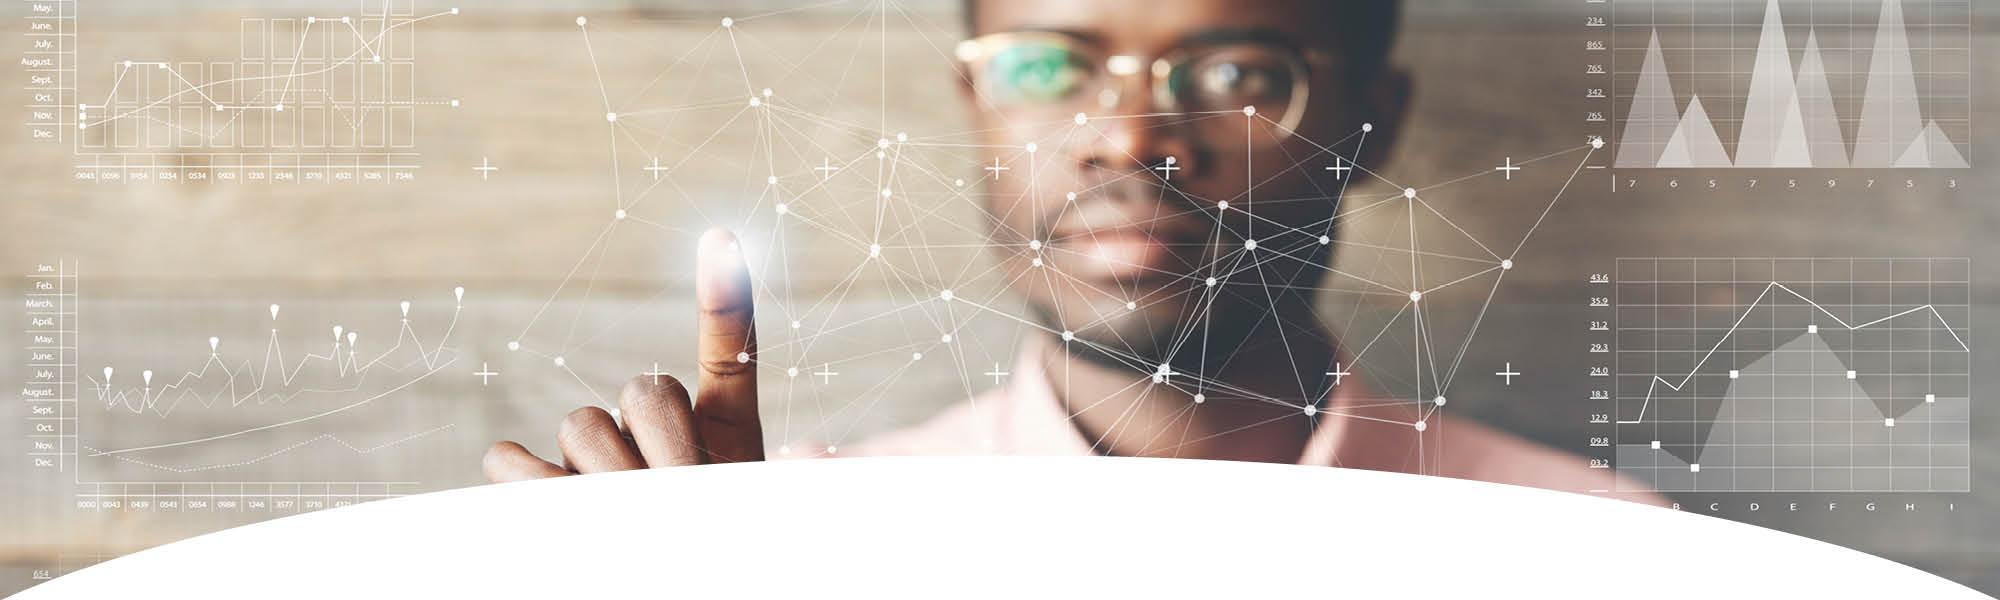 Volunteer Sign Up - Man computing data